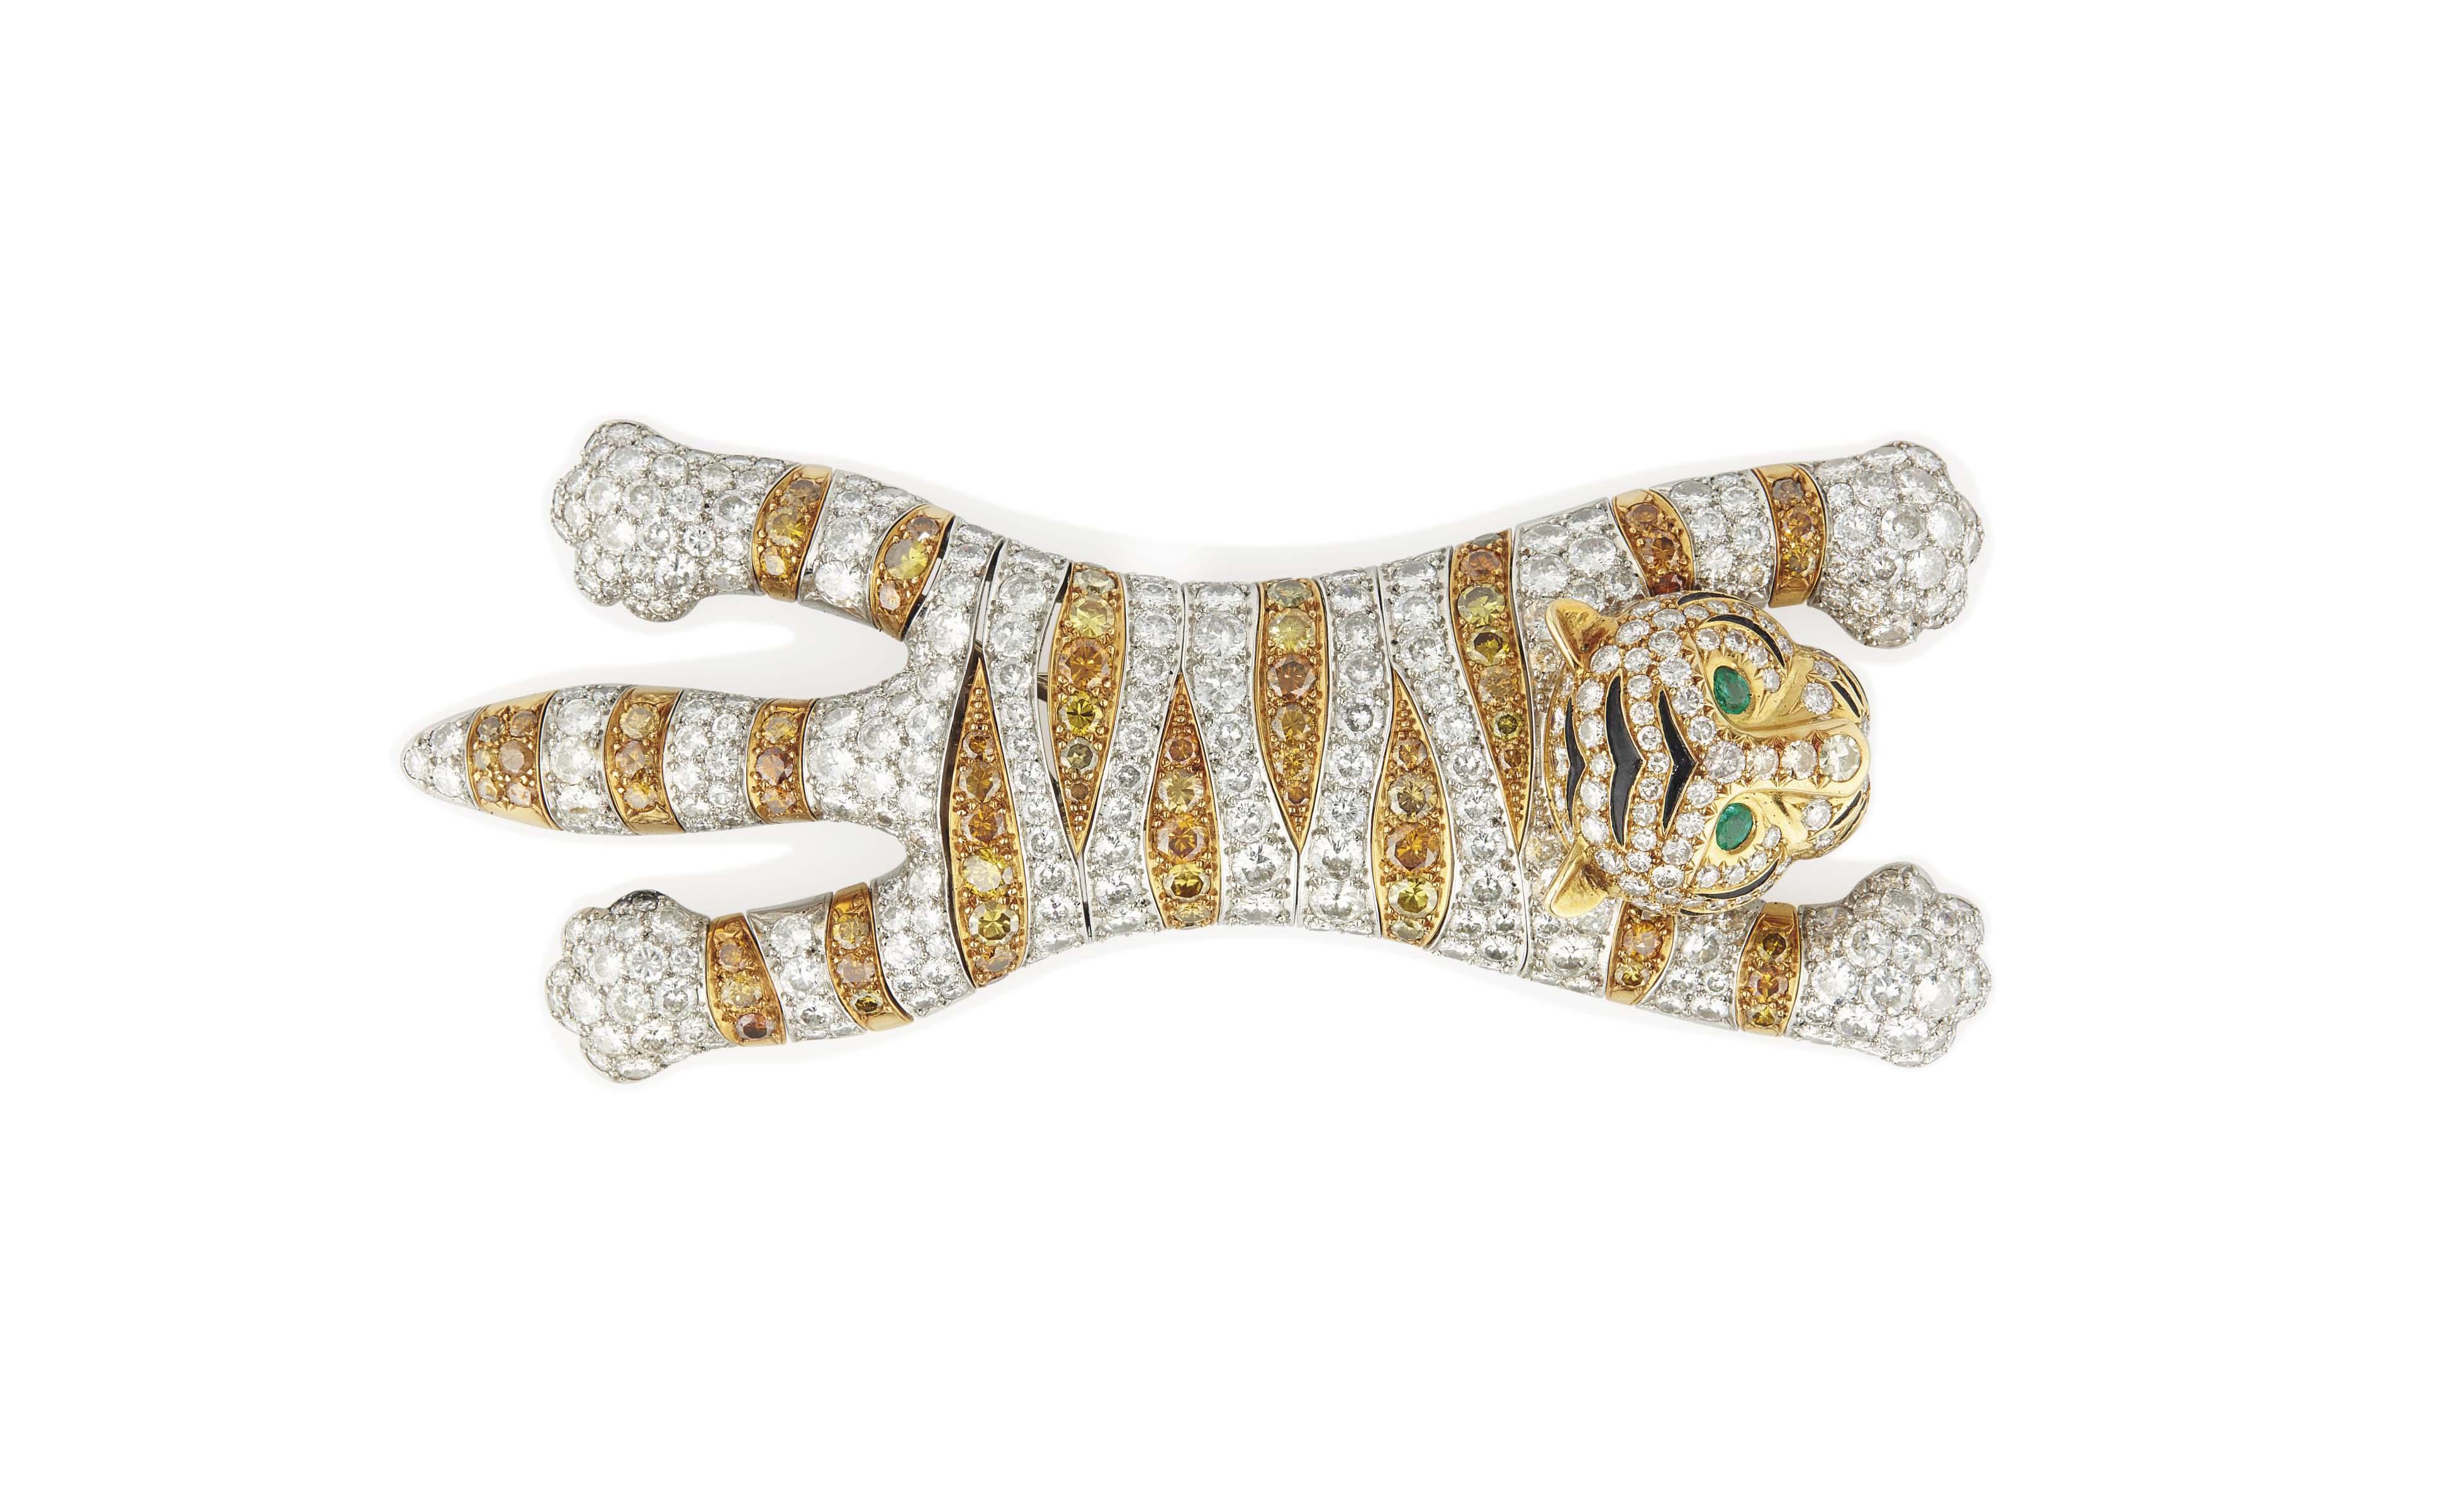 A DIAMOND, COLOURED DIAMOND, EMERALD AND ENAMEL 'TIGER' SHOULDER BROOCH, BY RENÉ BOIVIN